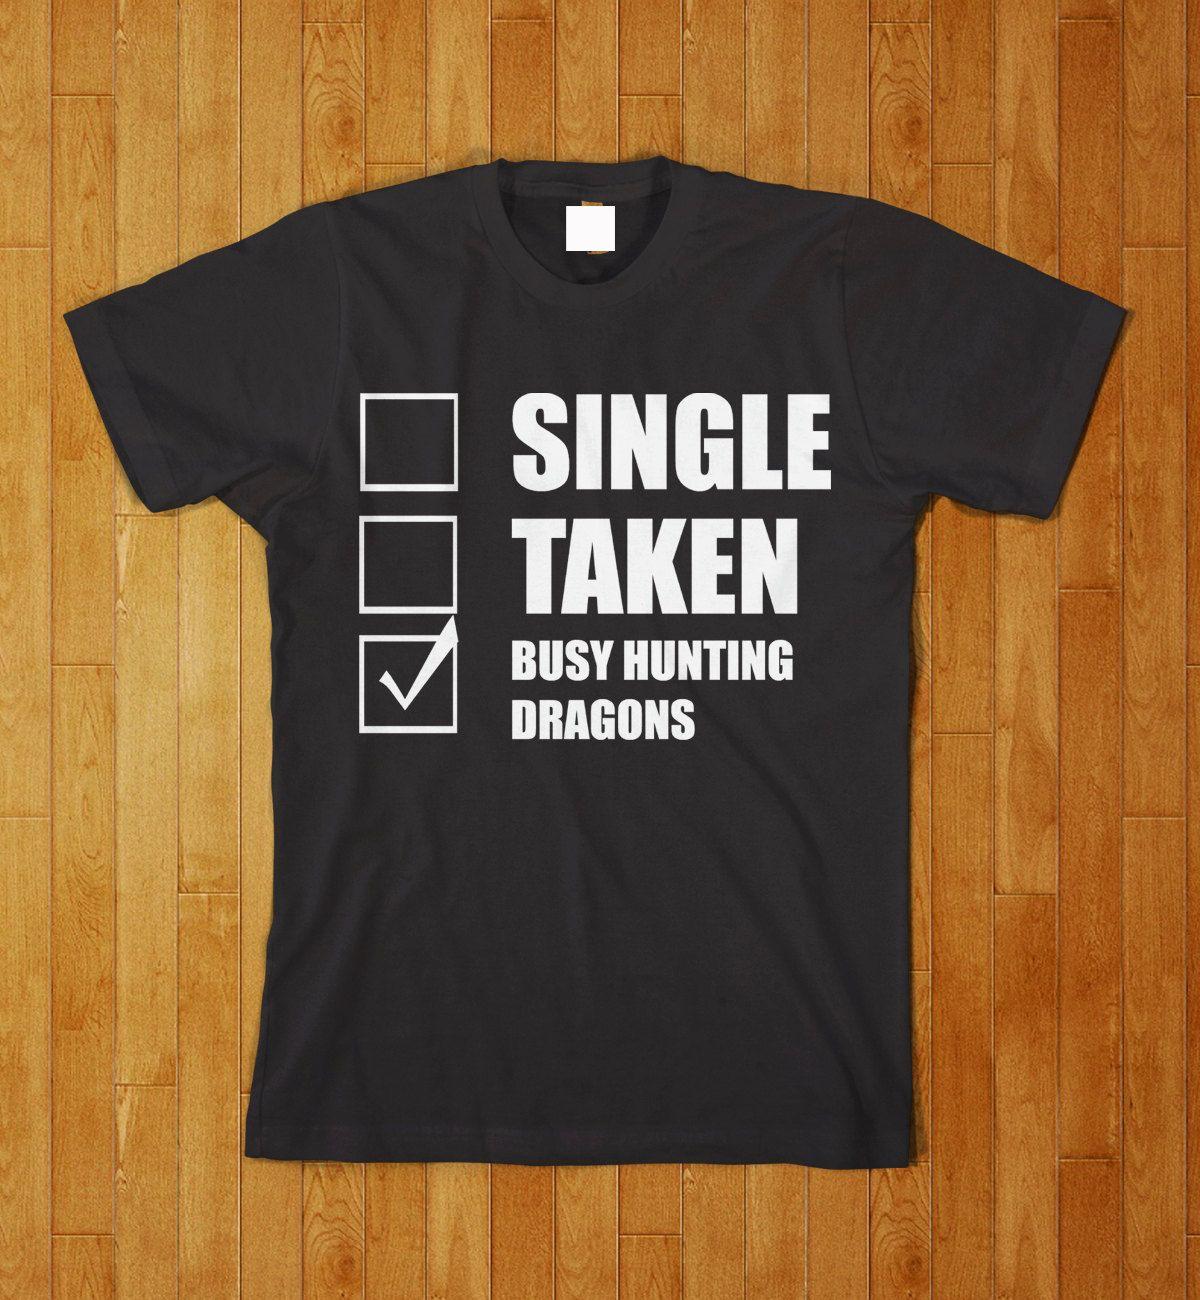 Skyrim Video Game Funny Nerd Gamer Shirt I don't play